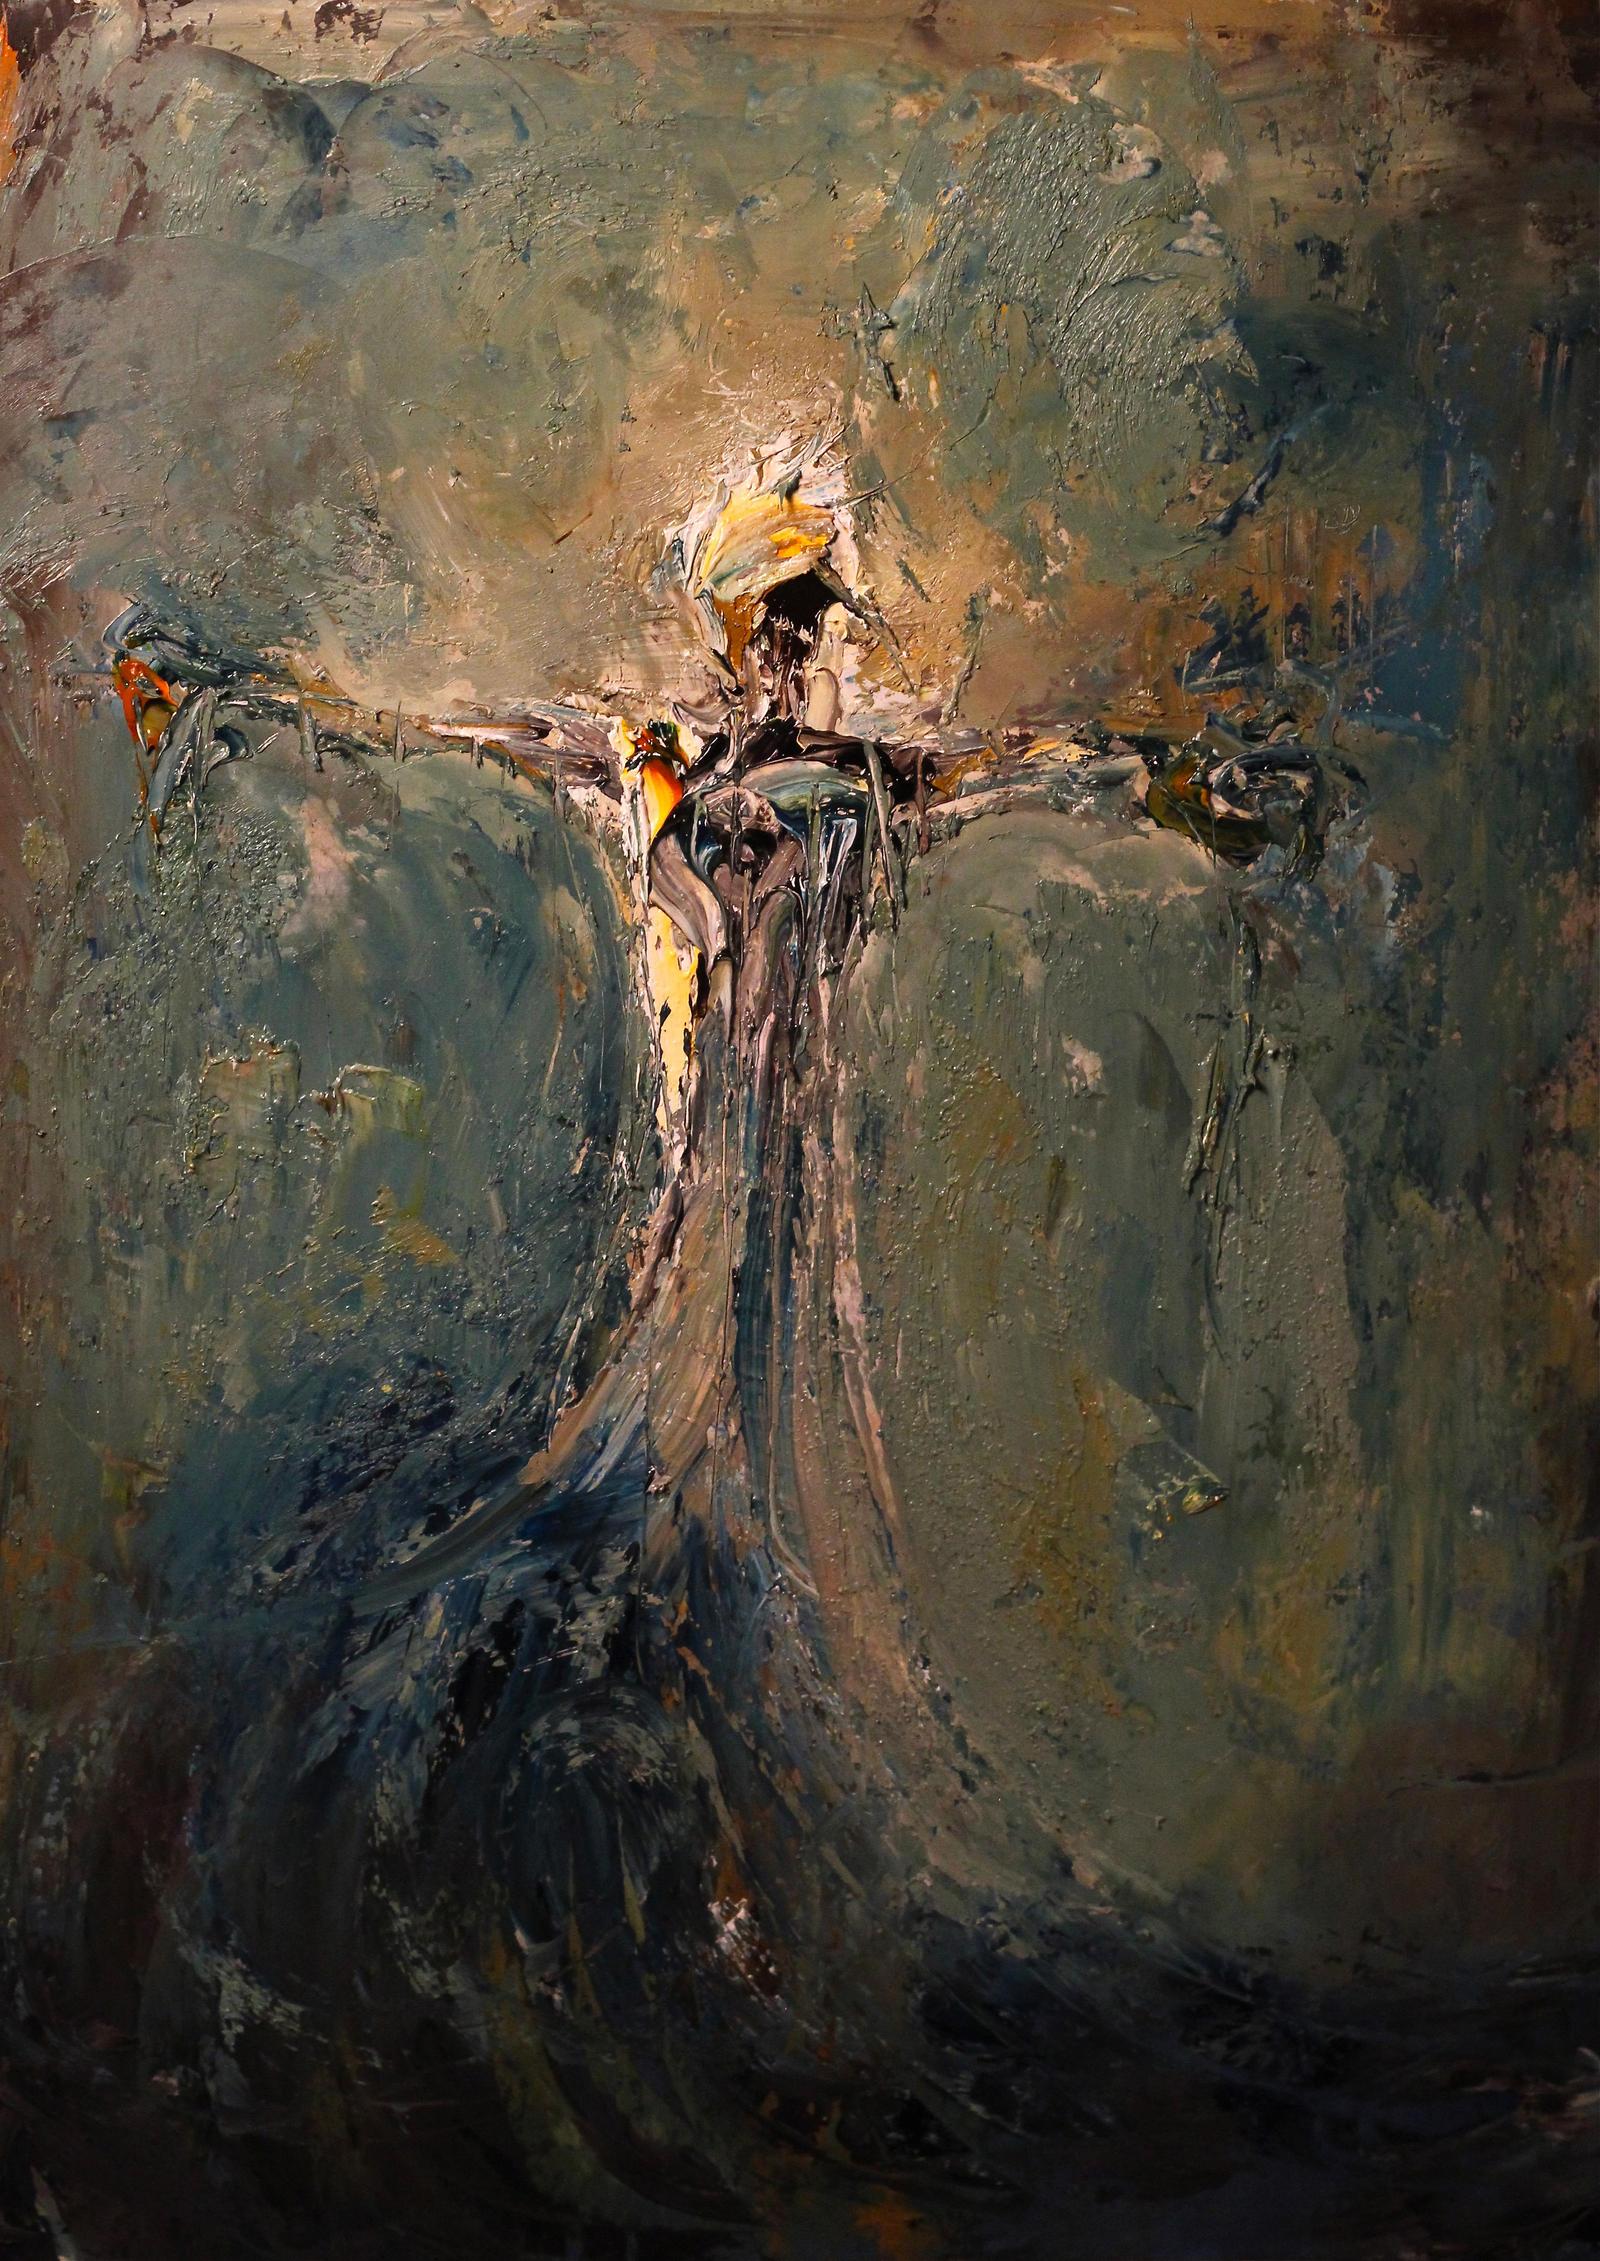 As An Angel Light by DeLumine on DeviantArt